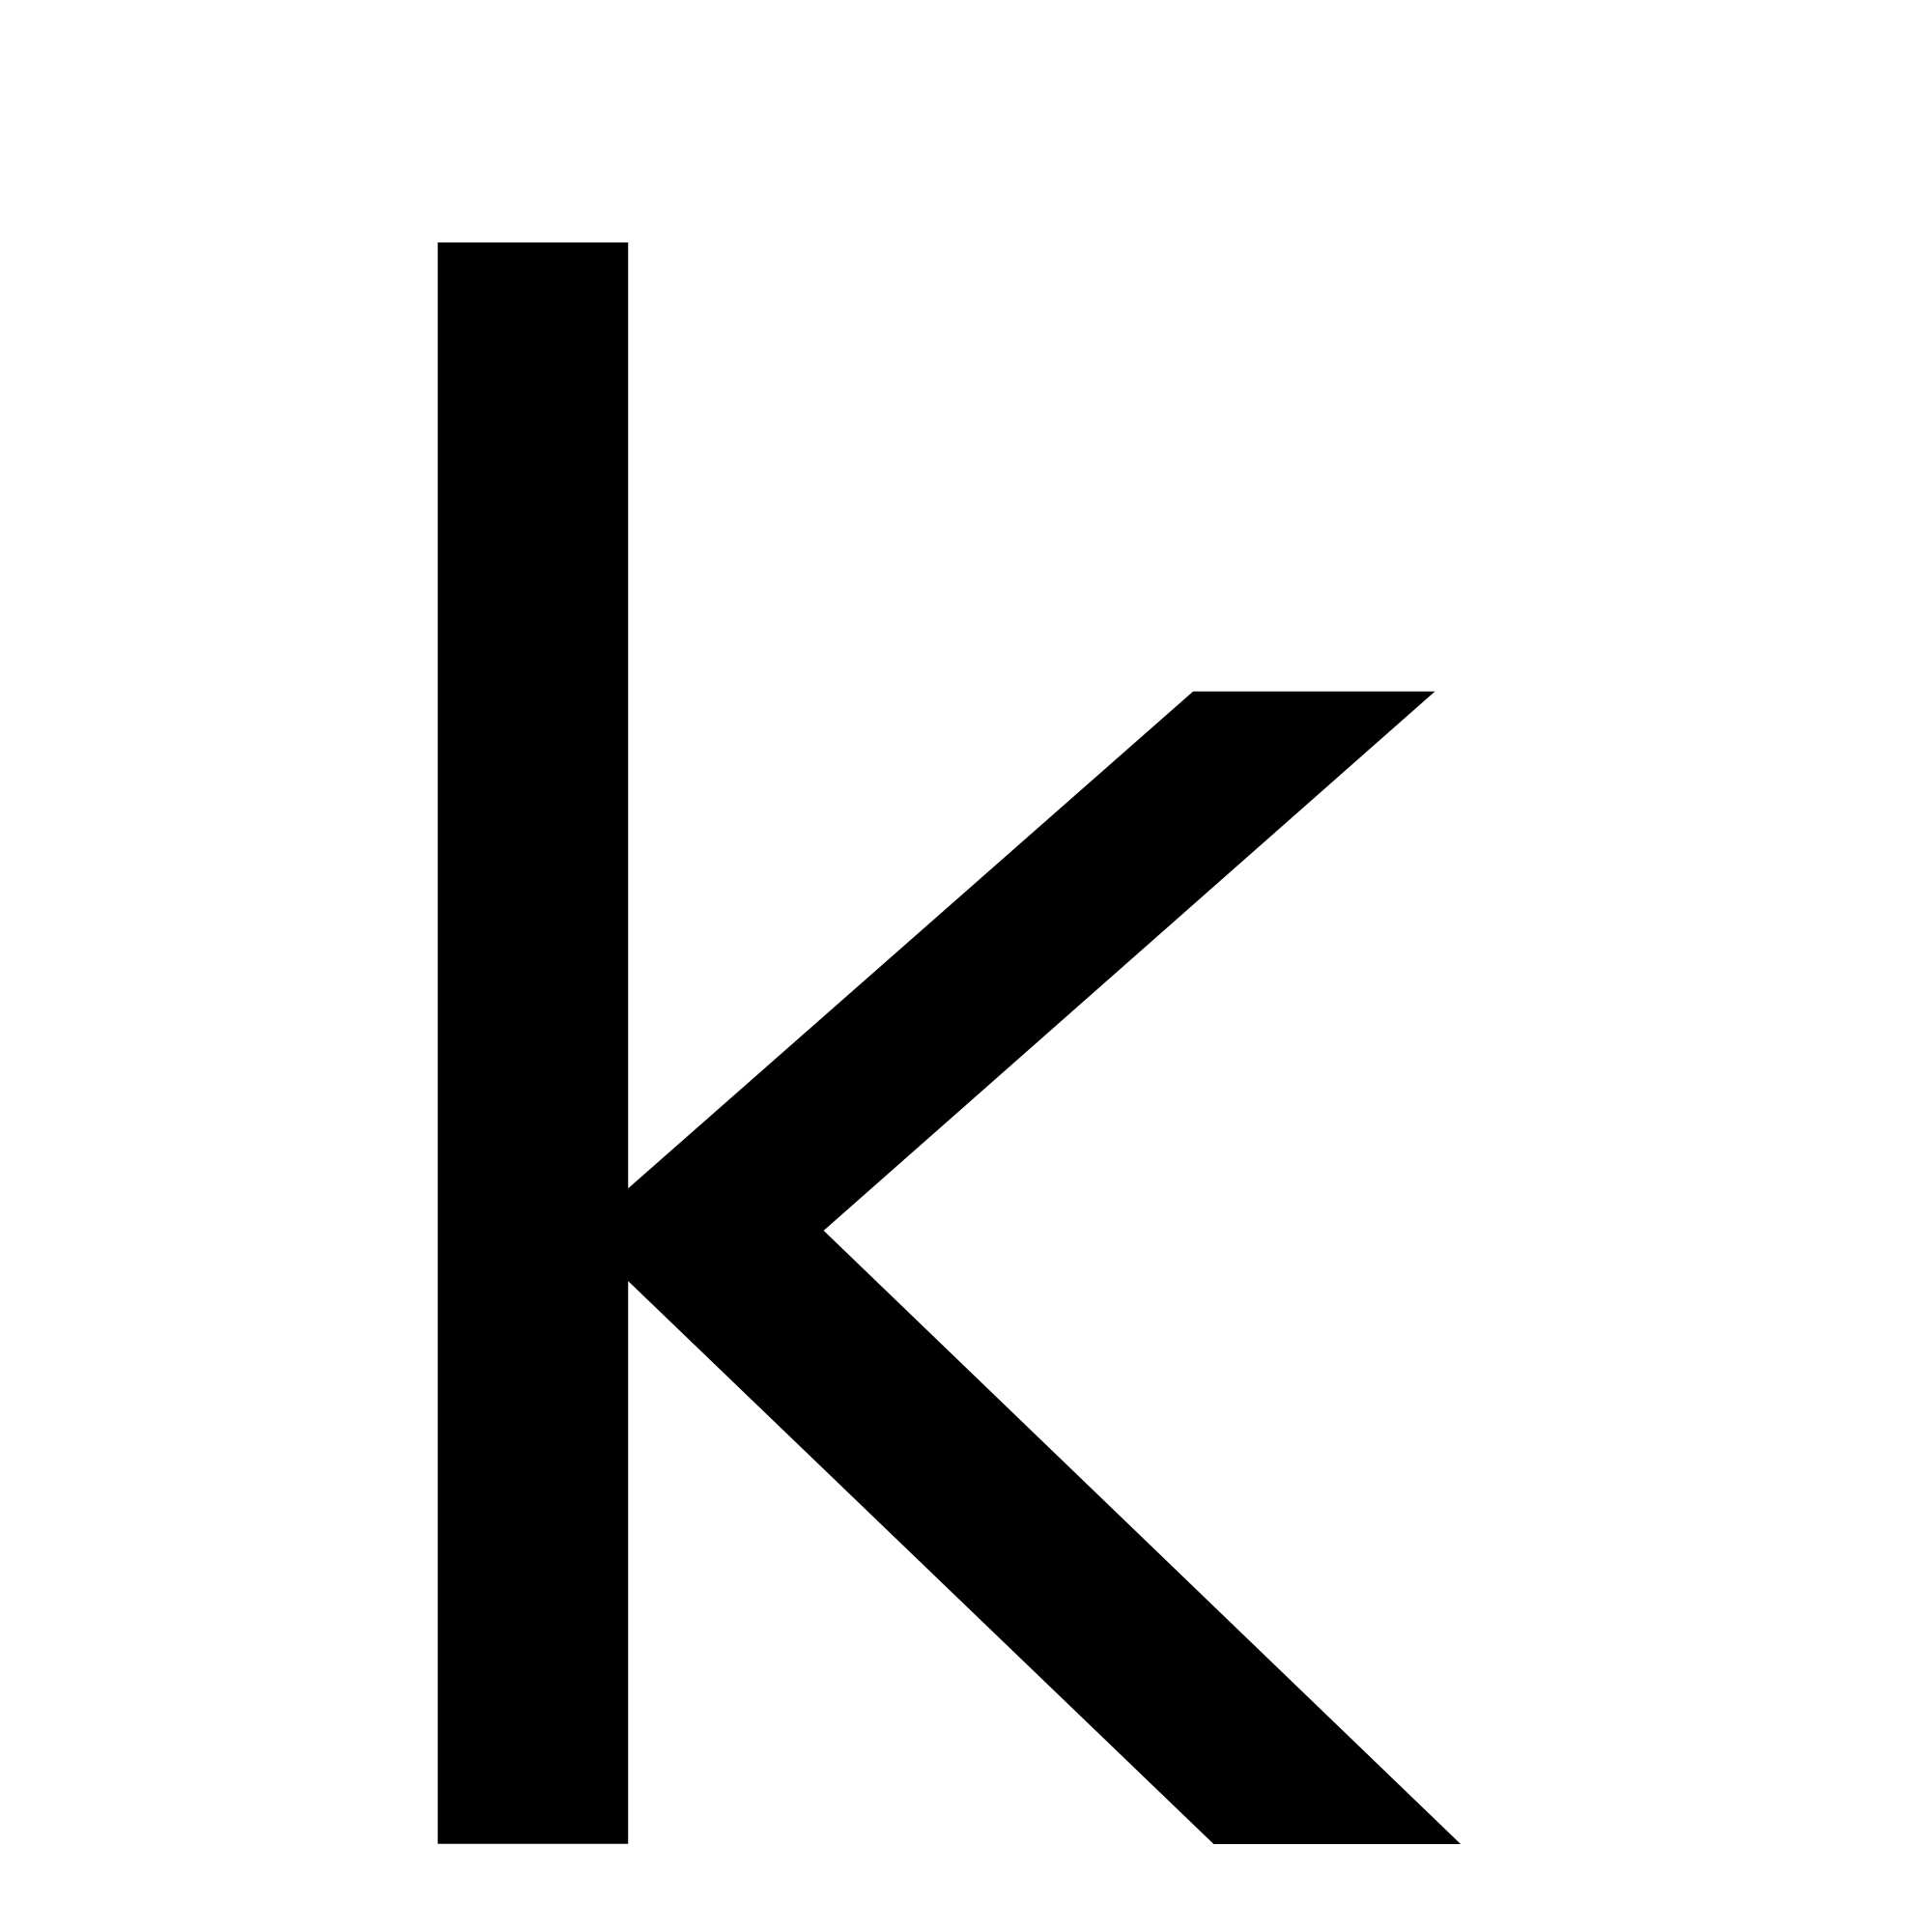 Open PlusPng.com  - Letter K HD PNG